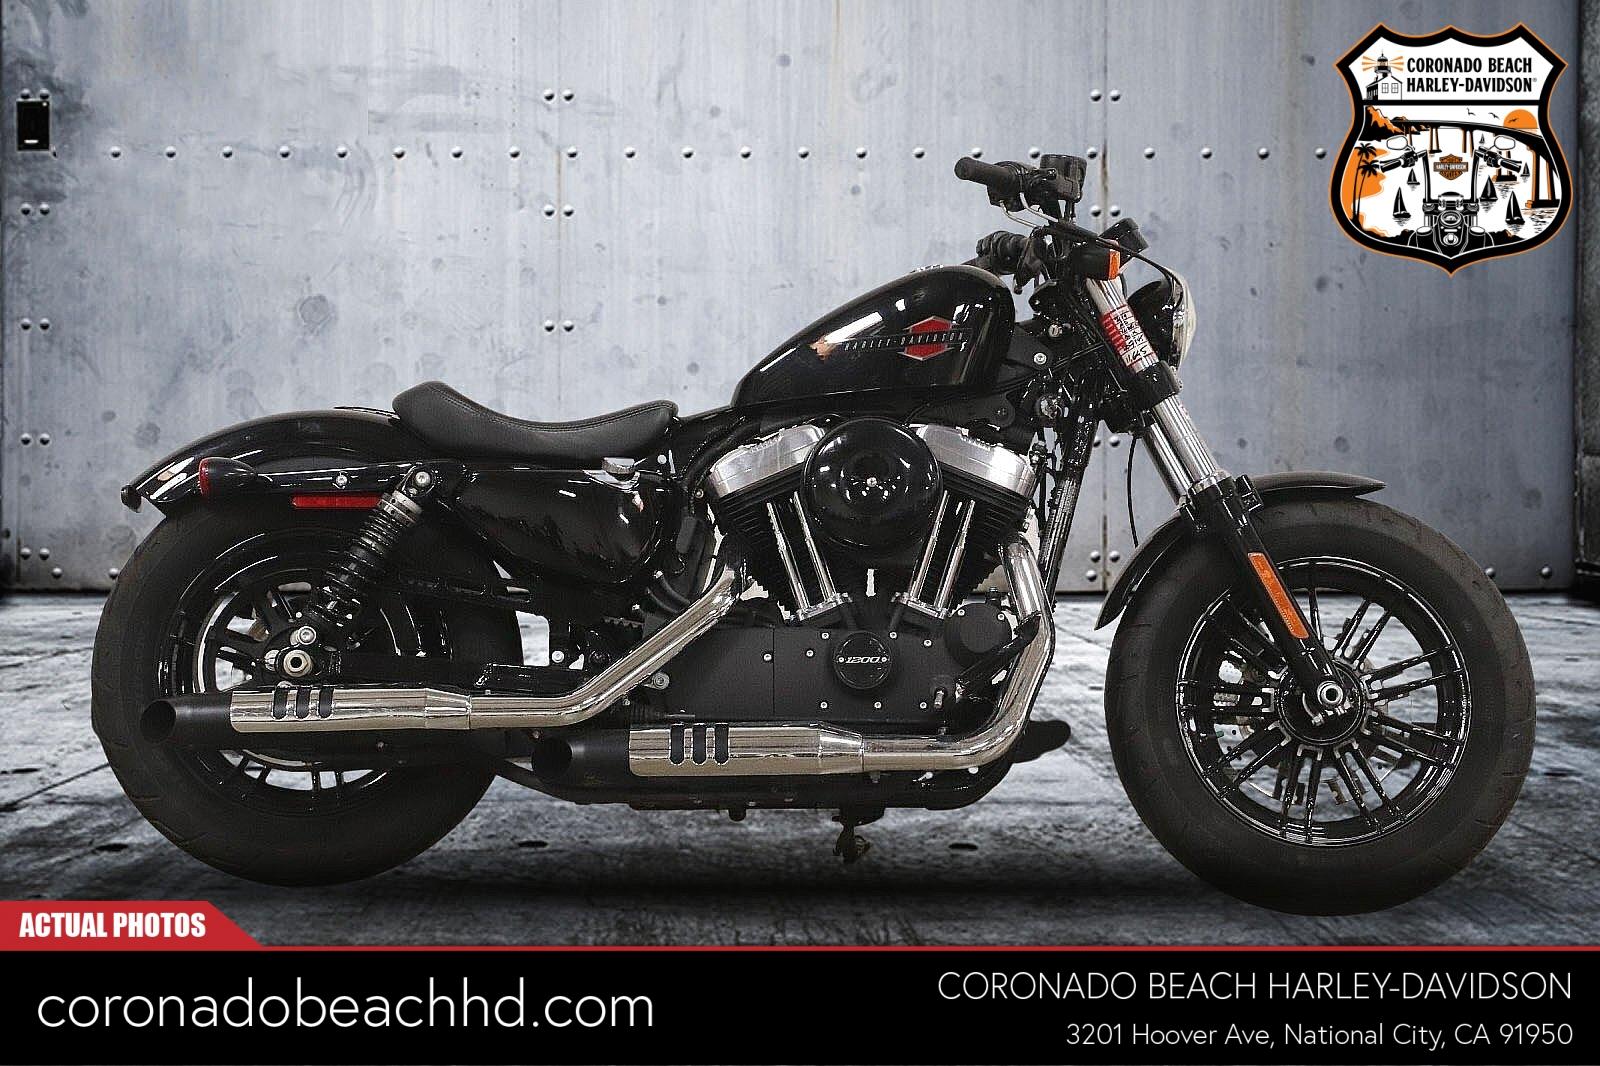 2019 Harley-Davidson Forty-Eight [93]